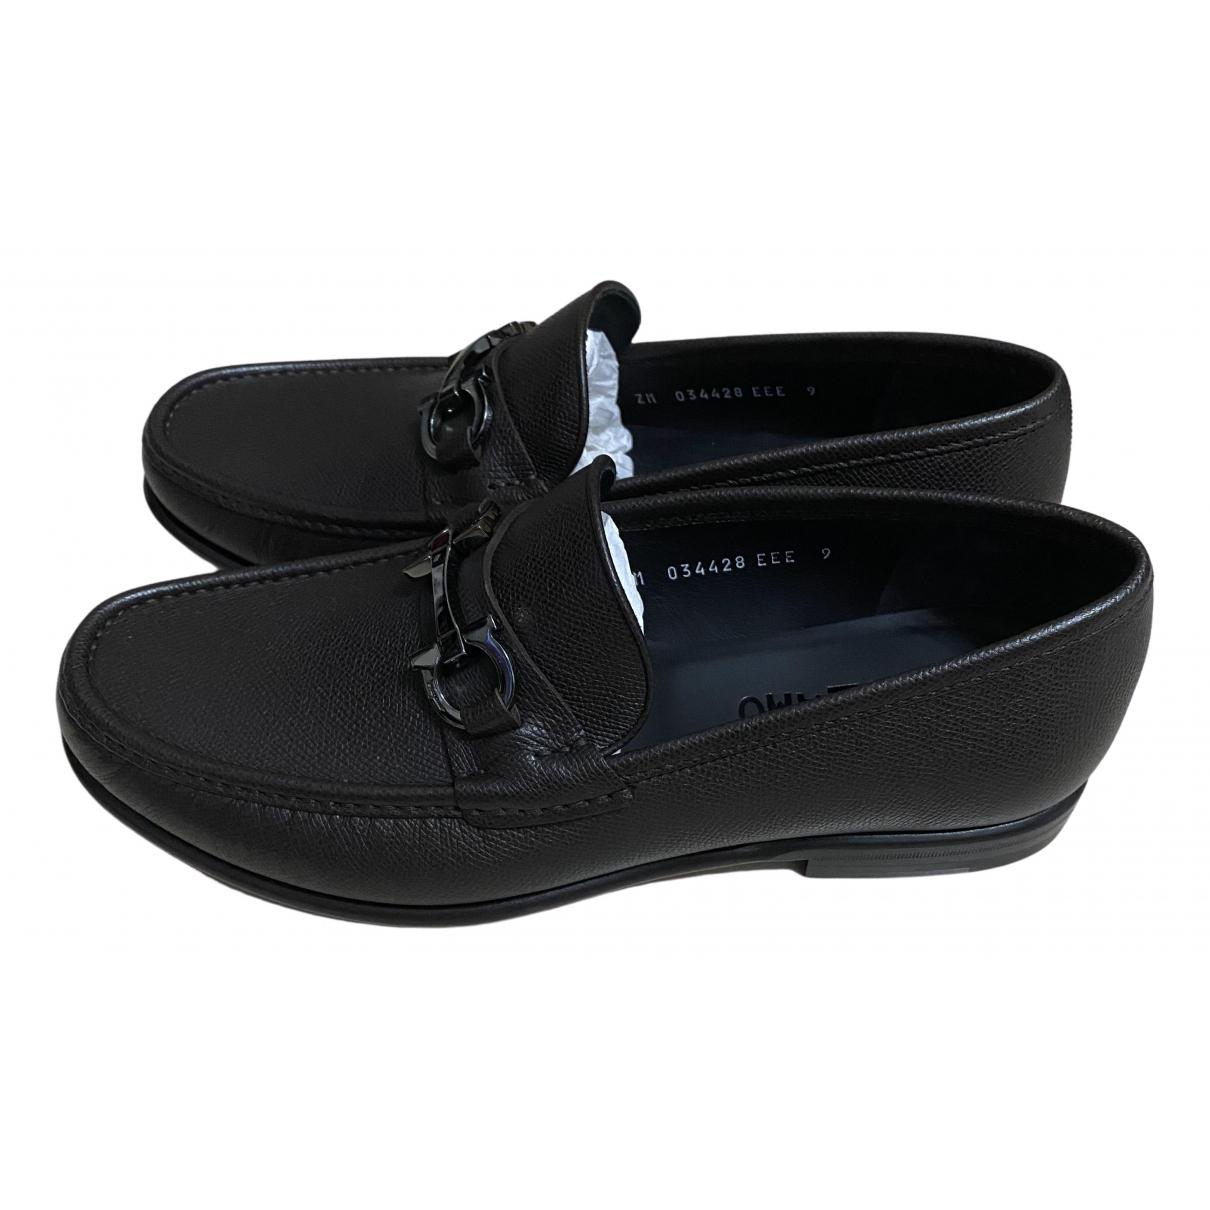 Salvatore Ferragamo \N Brown Leather Flats for Men 9 UK